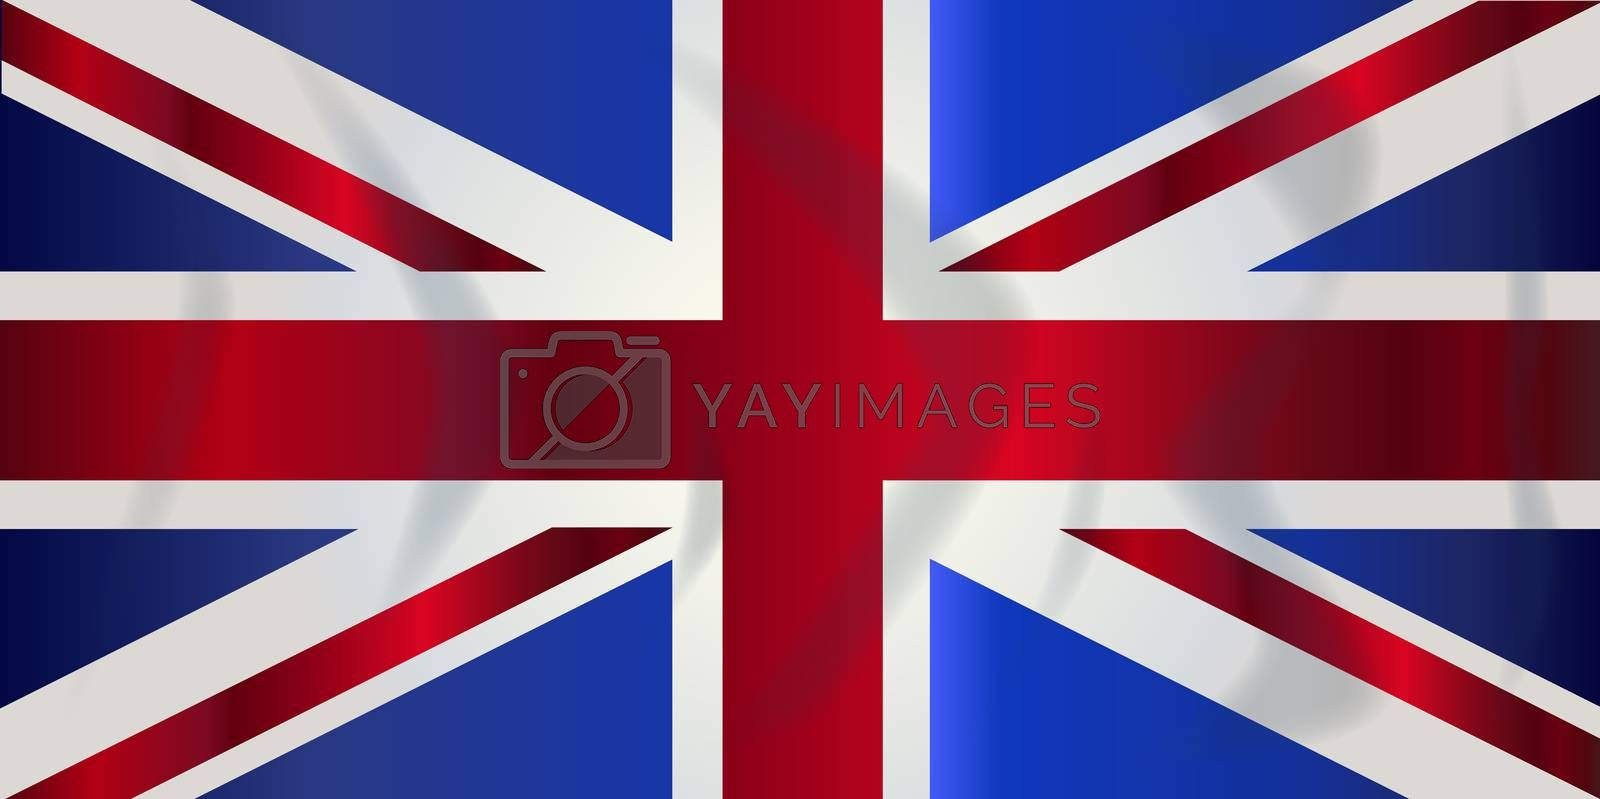 Typical Union Jack flag of the United Kingdom of England Scotland Ireland and Wales